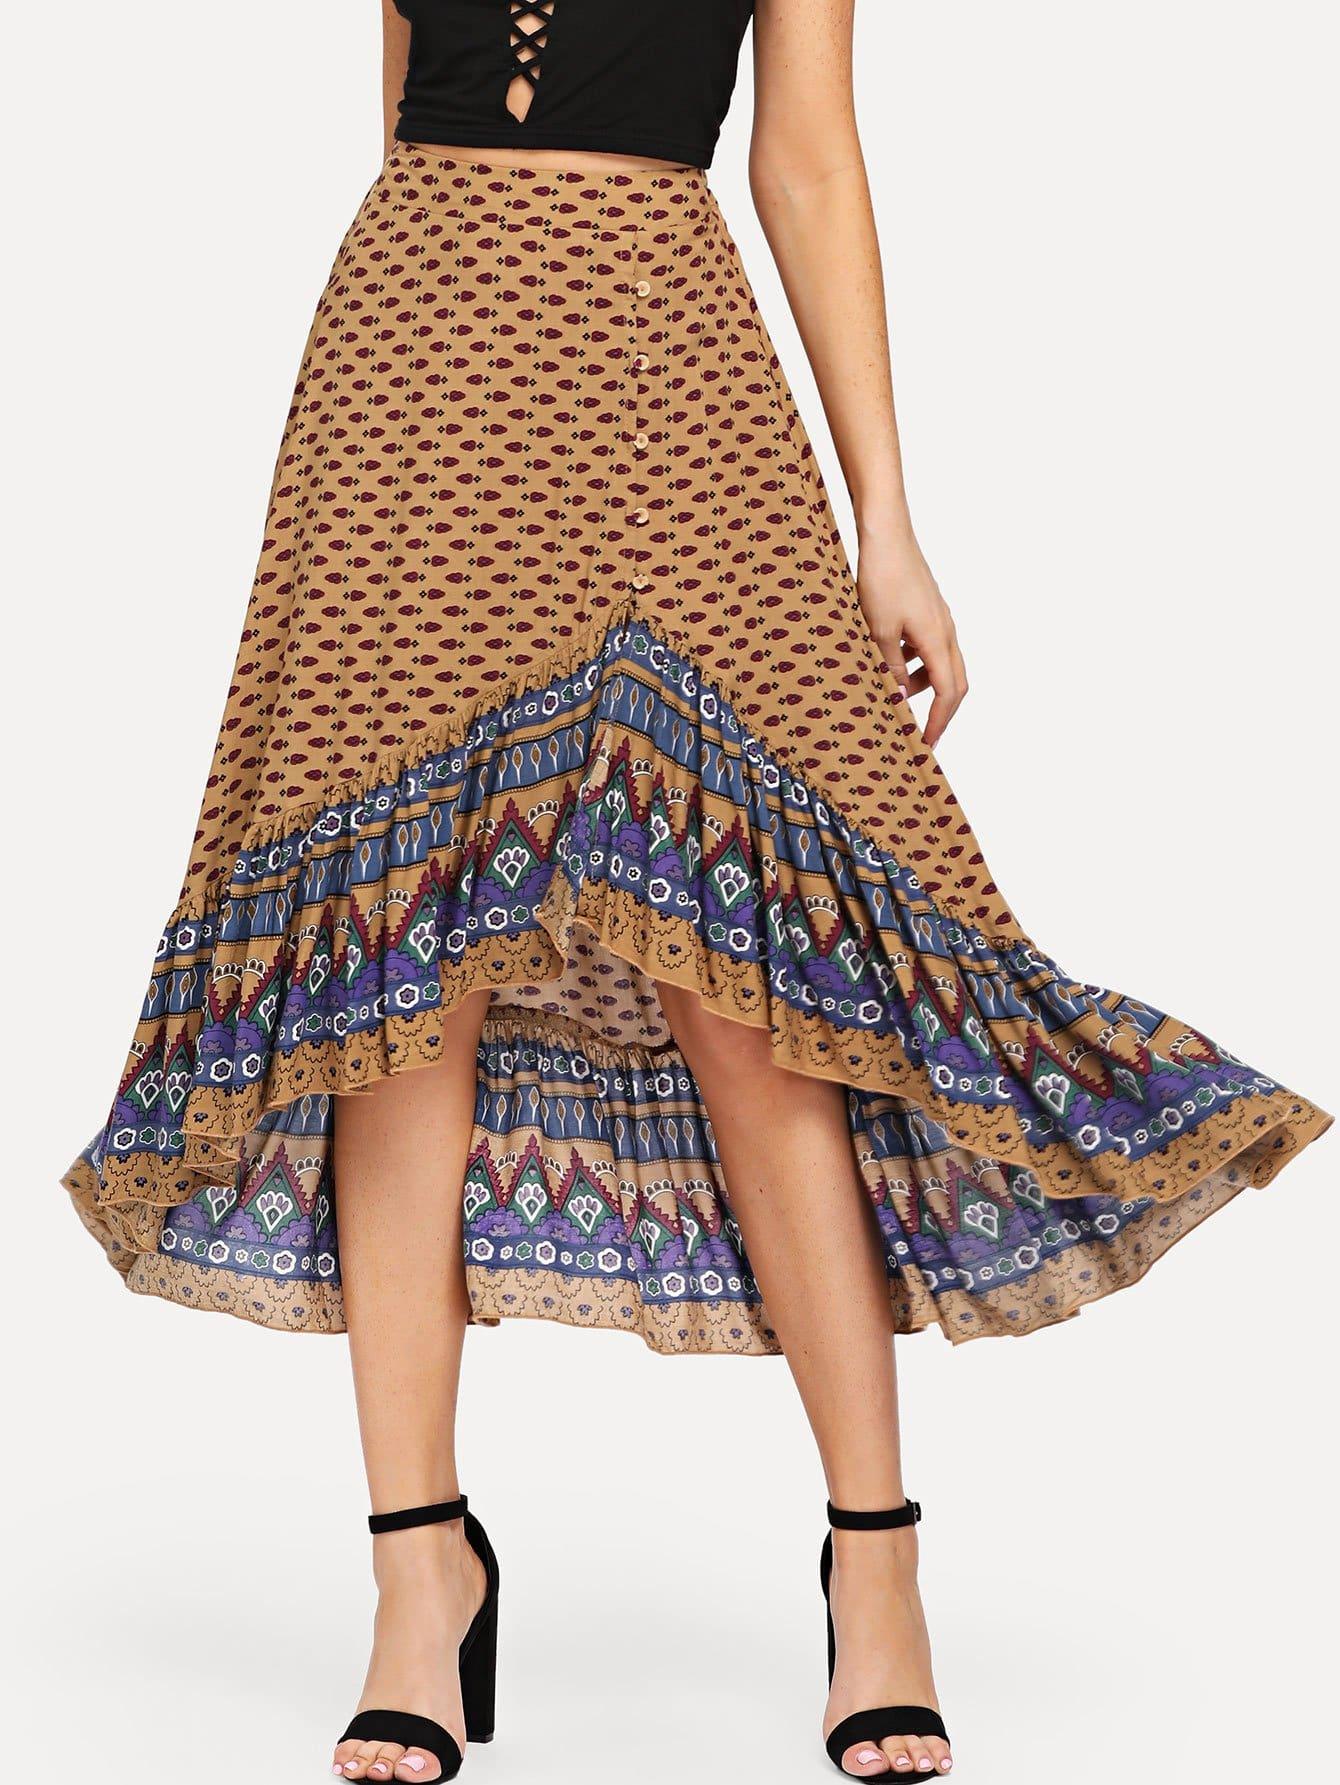 Buttoned Front Asymmetric Hem Ornate Print Skirt asymmetric hem spot skirt